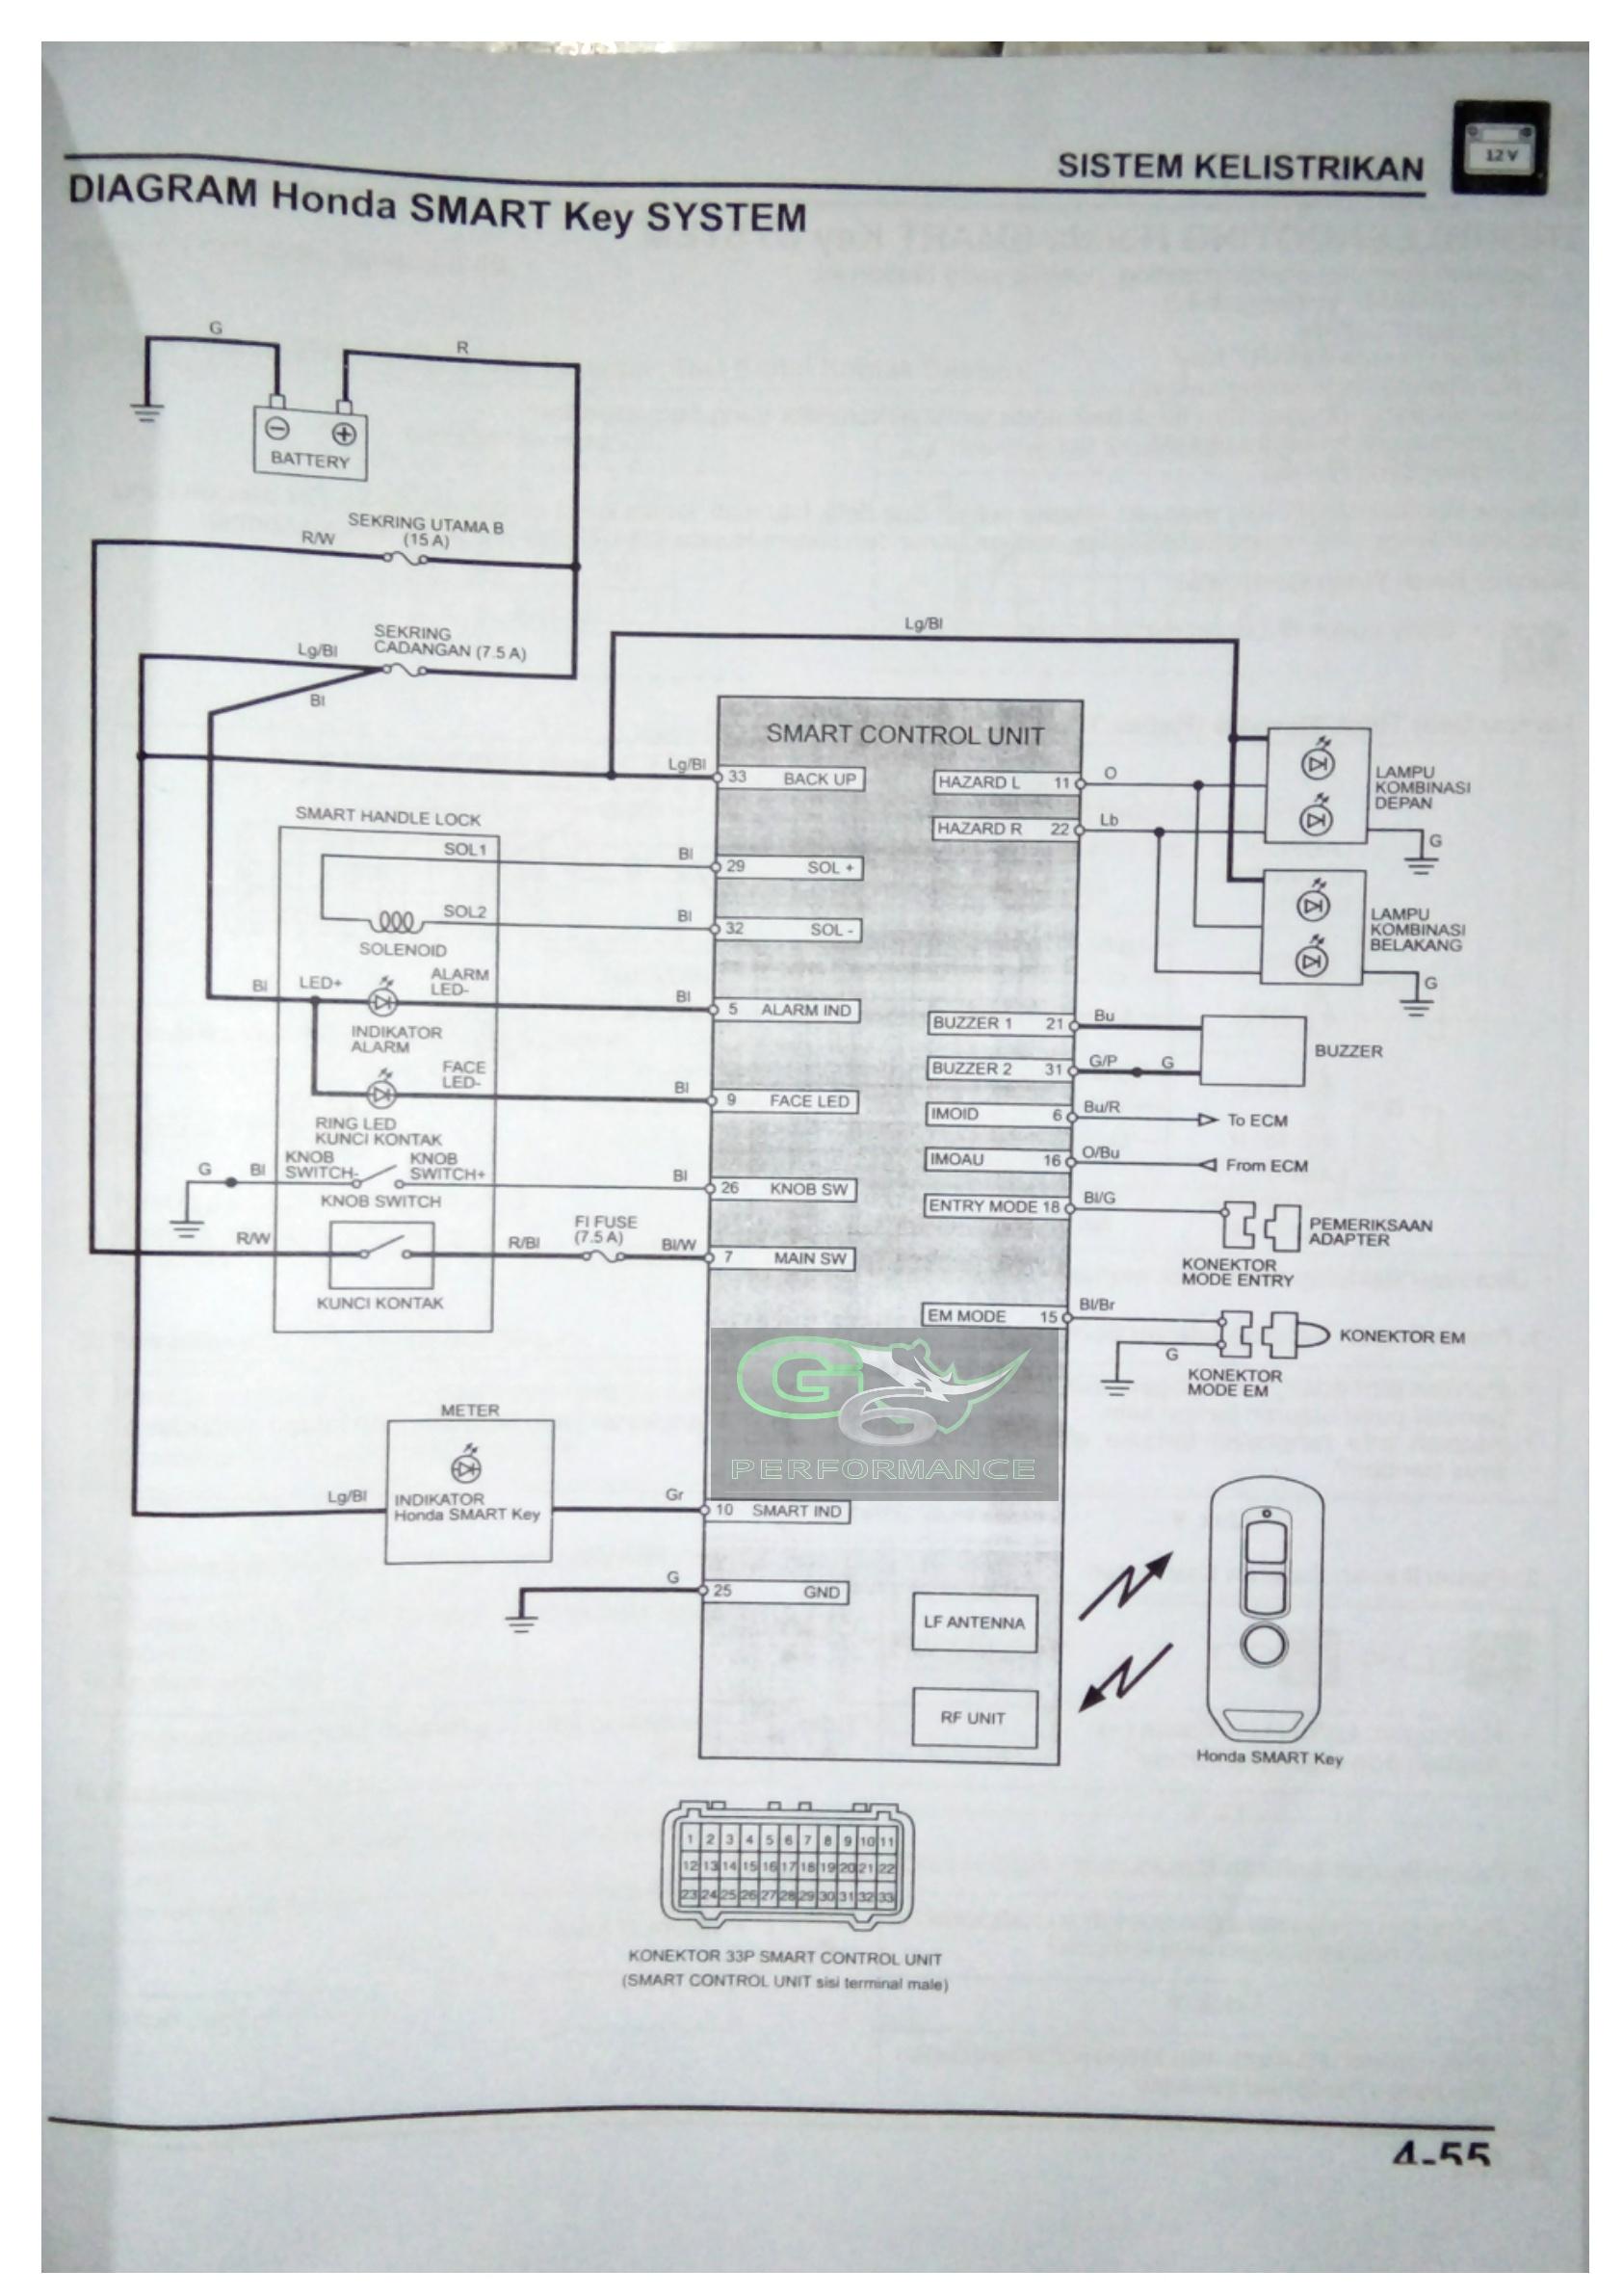 medium resolution of electric wiring system diagram honda new pcx 150 2018 gisix s blog honda scoppyi 2015 wiring diagram